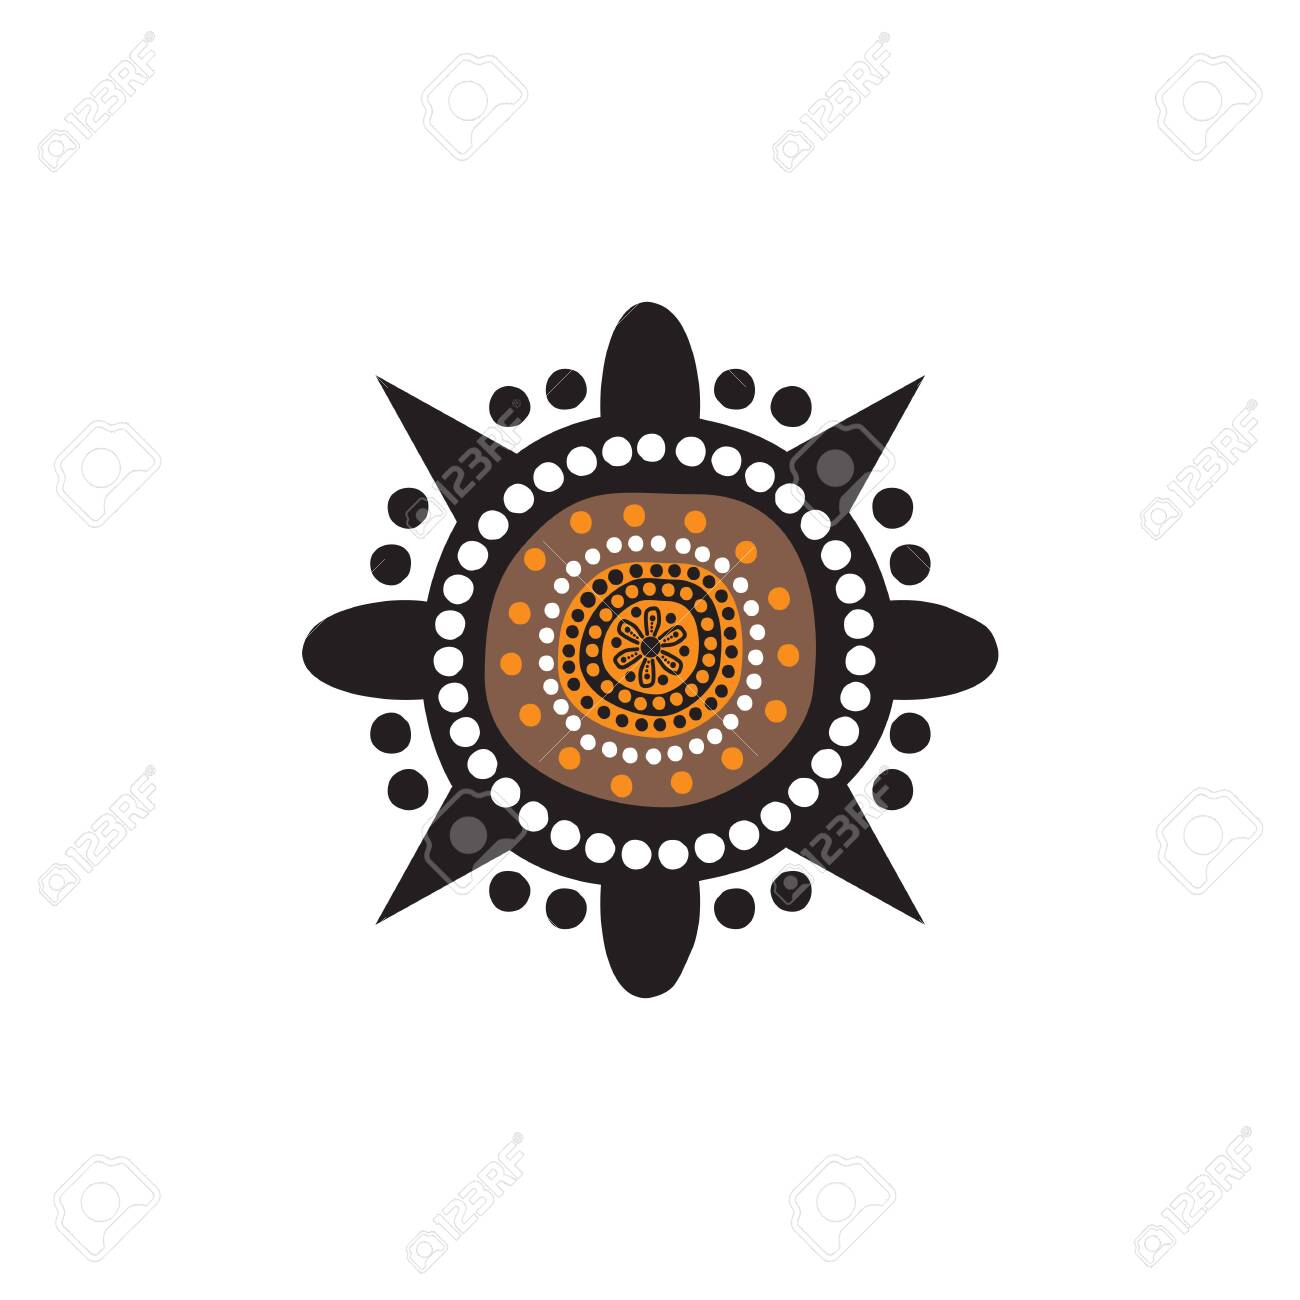 Aboriginal art dots painting logo design template - 126863497